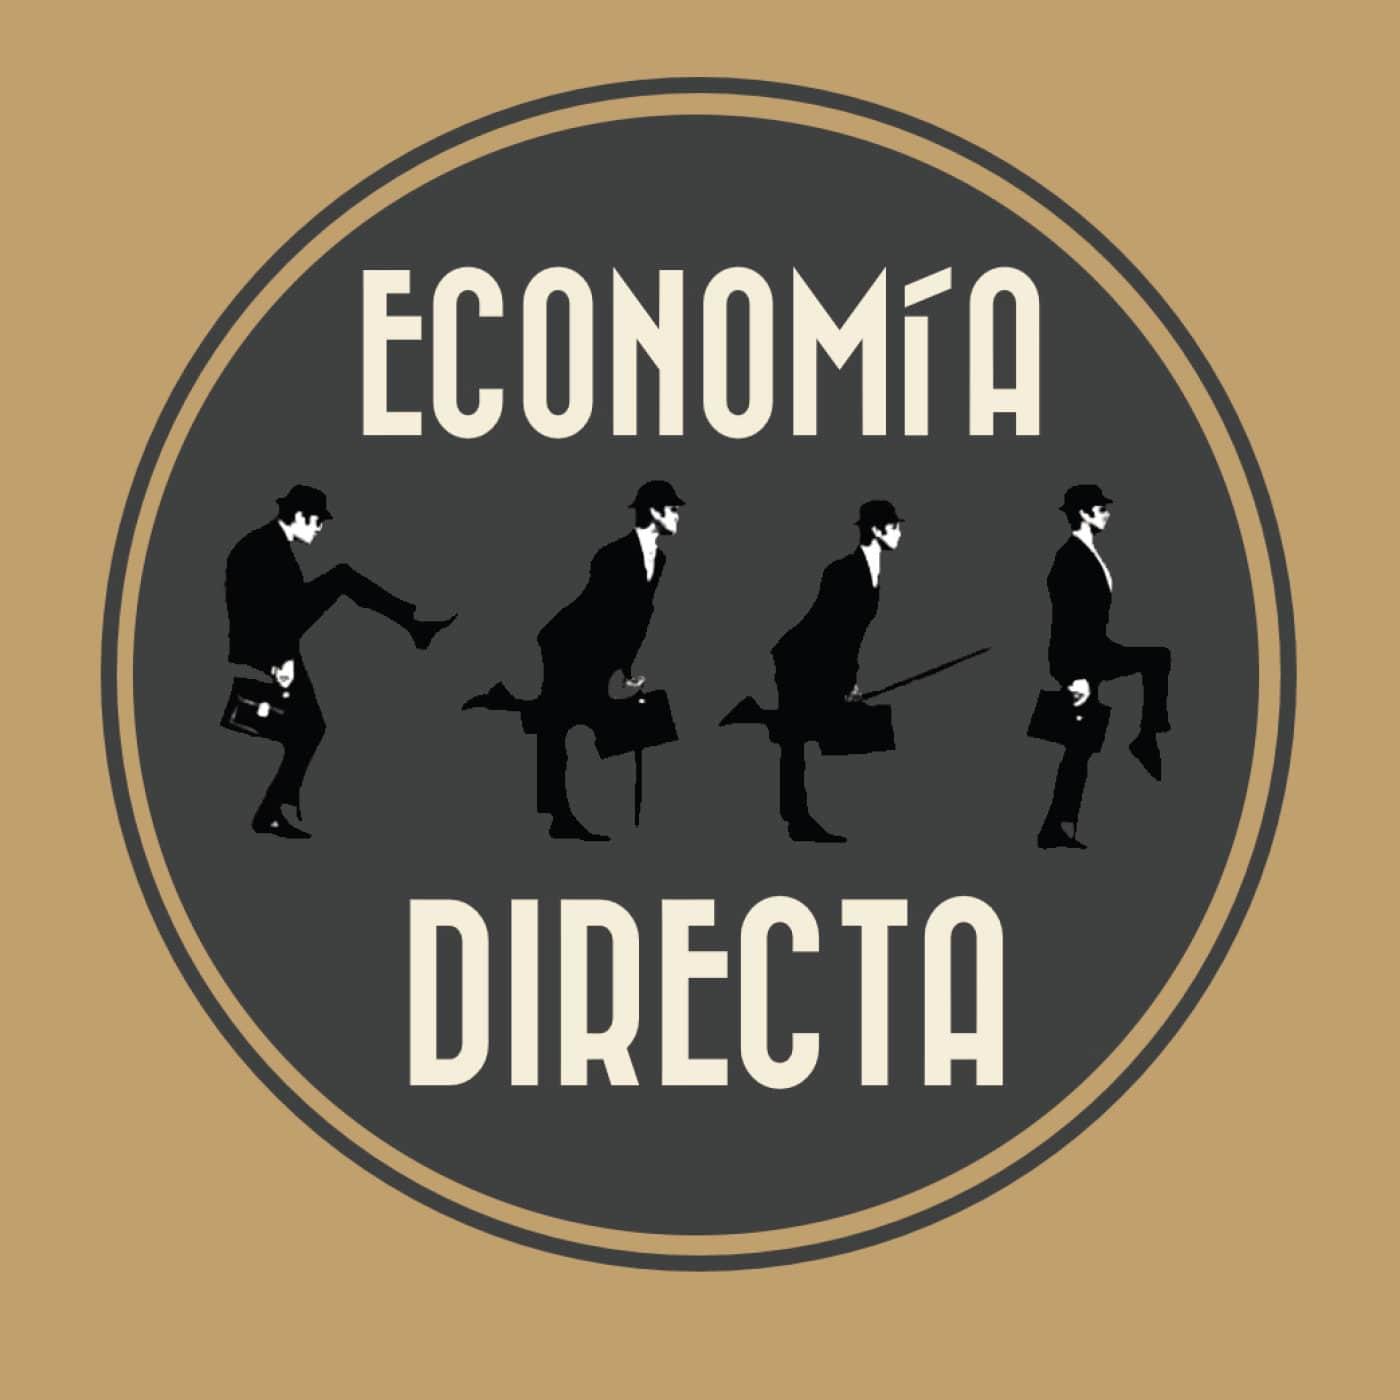 Economia directa